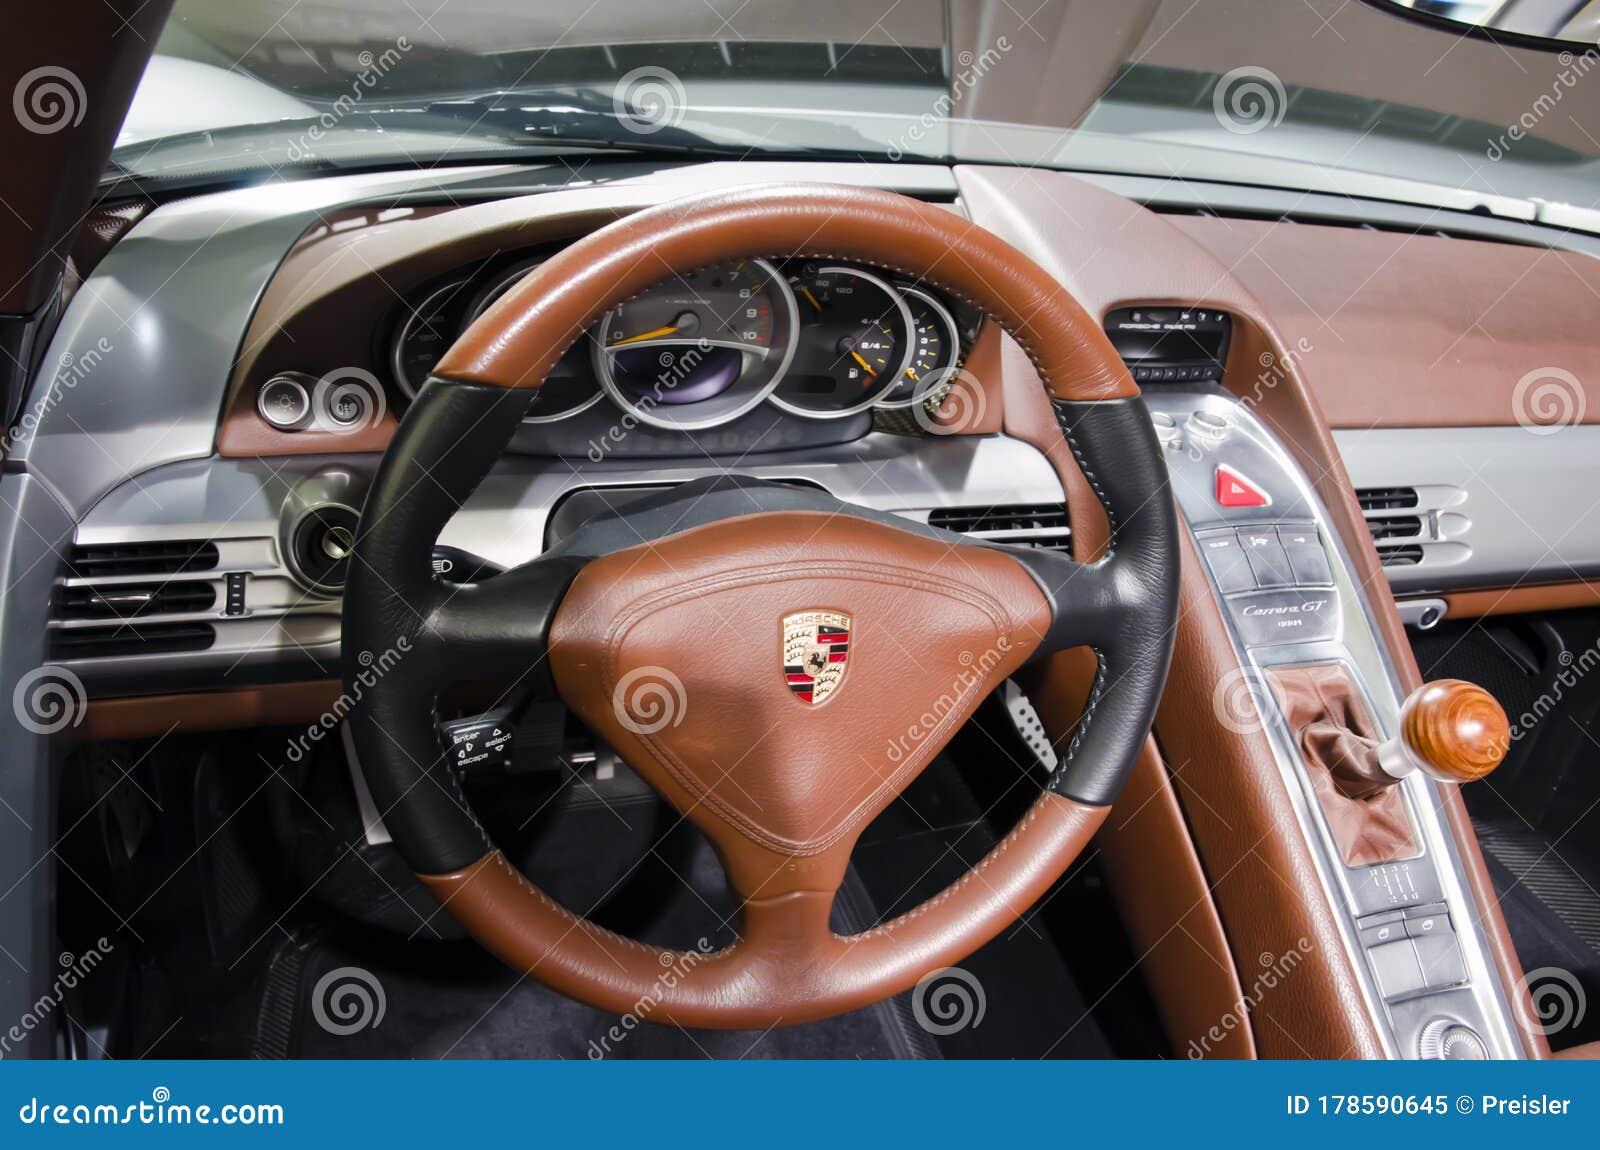 Porsche Museum Porsche Carrera Gt 2003 Dashboard Editorial Image Image Of Design Interior 178590645